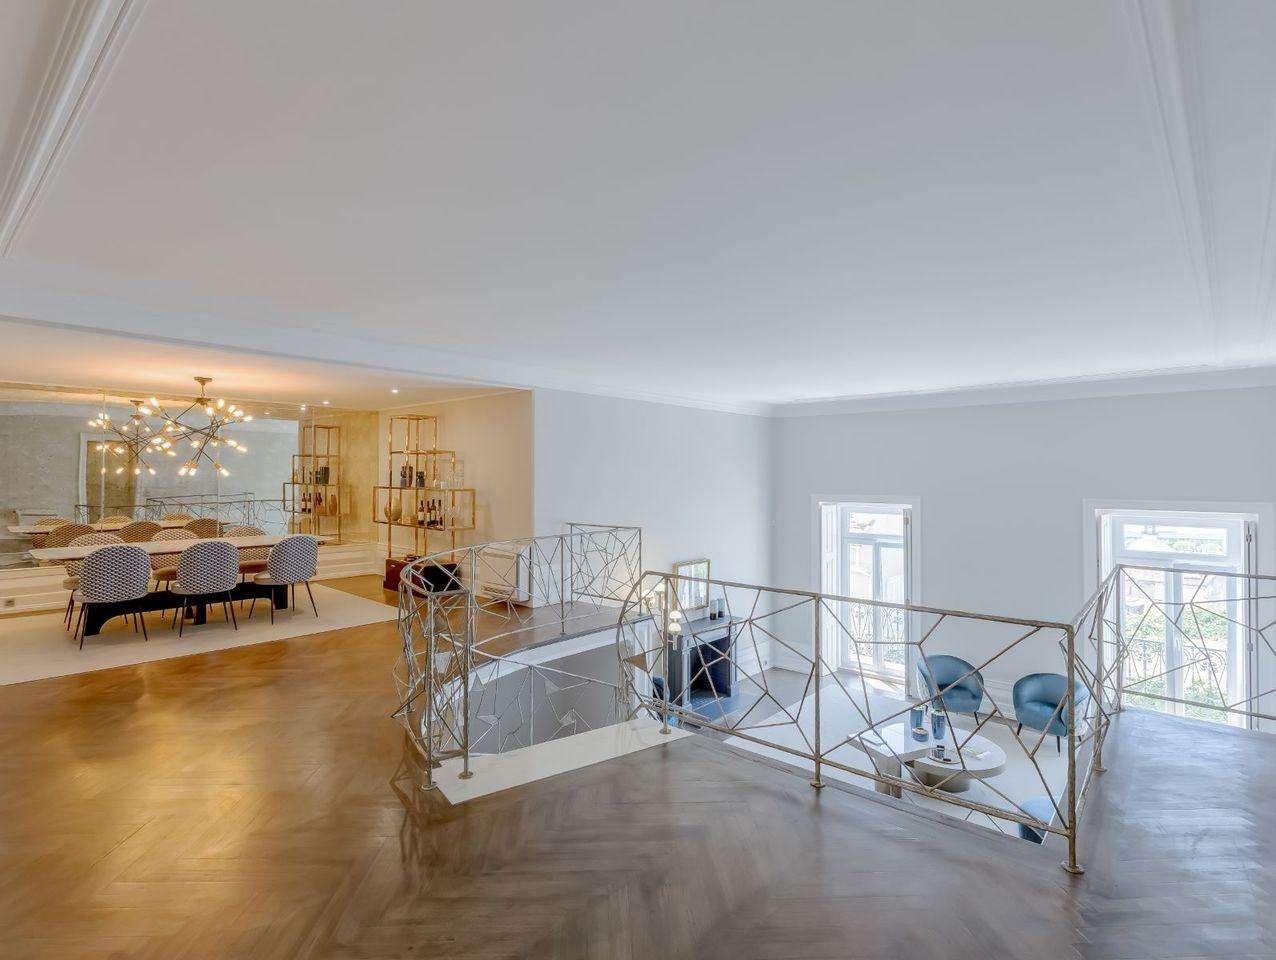 Apartamento para comprar, Misericórdia, Lisboa - Foto 2